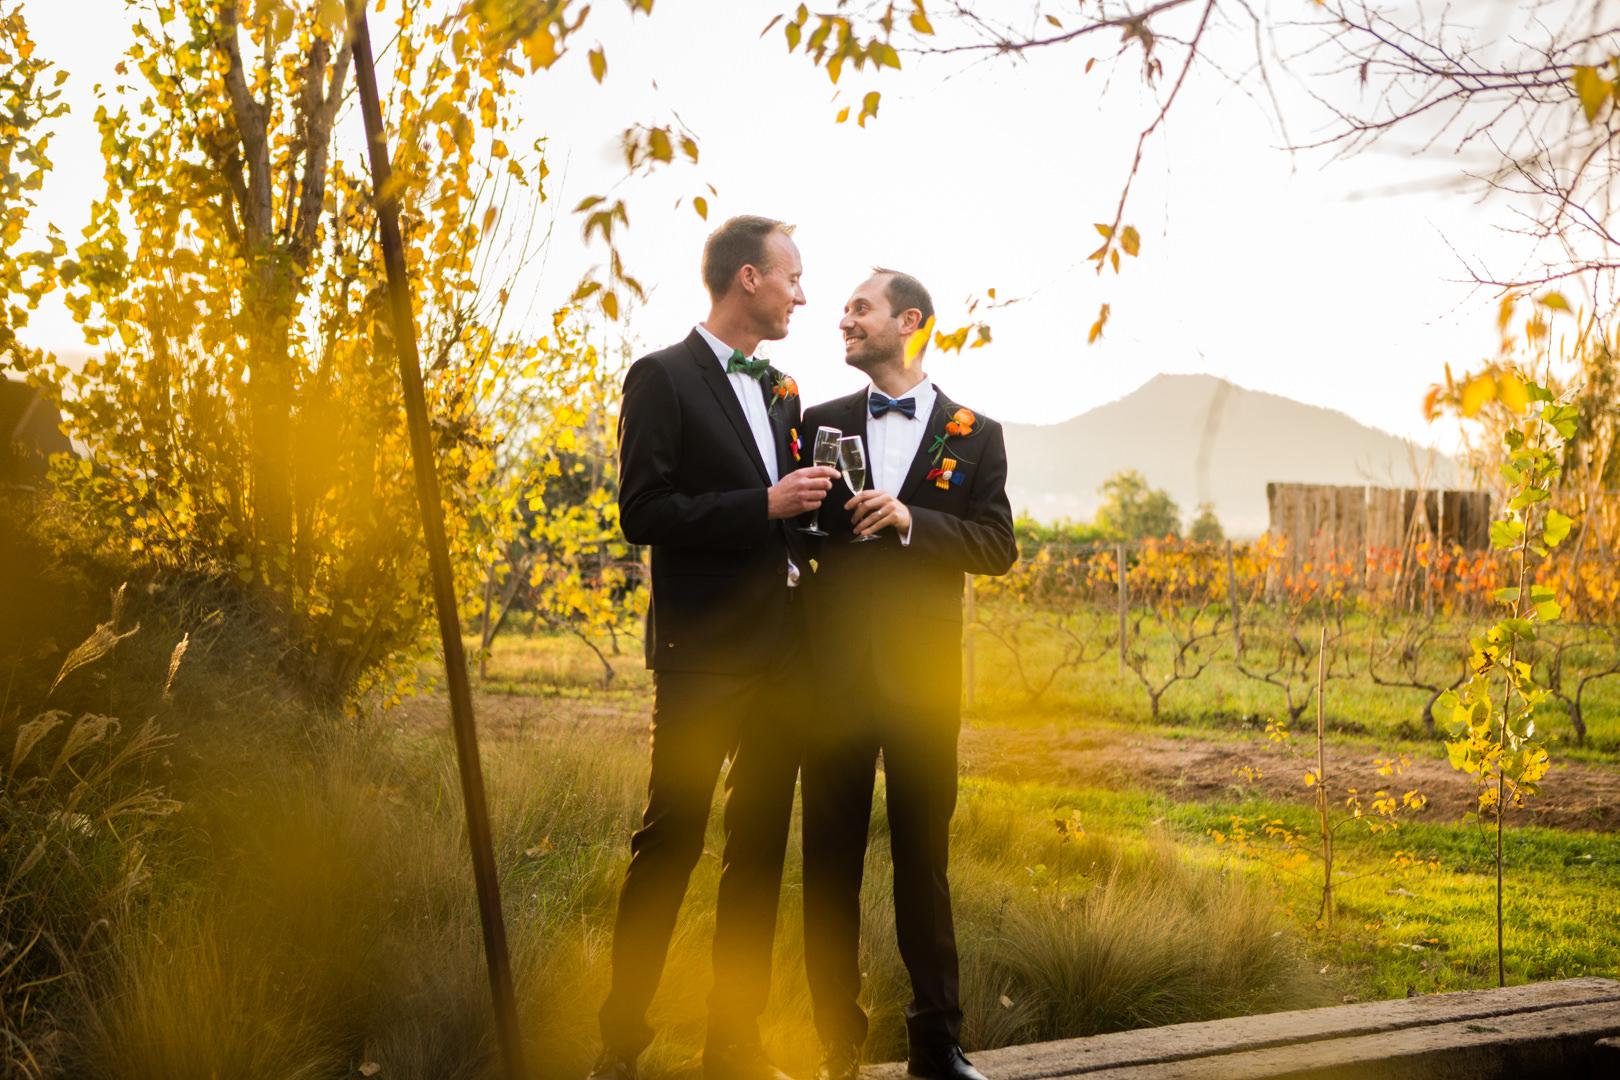 Same-sex-wedding-barcelona-boda- gay-samesex-engagement-Rafael-Torres-fotografo-bodas-sevilla-madrid-barcelona-wedding-photographer--45.jpg